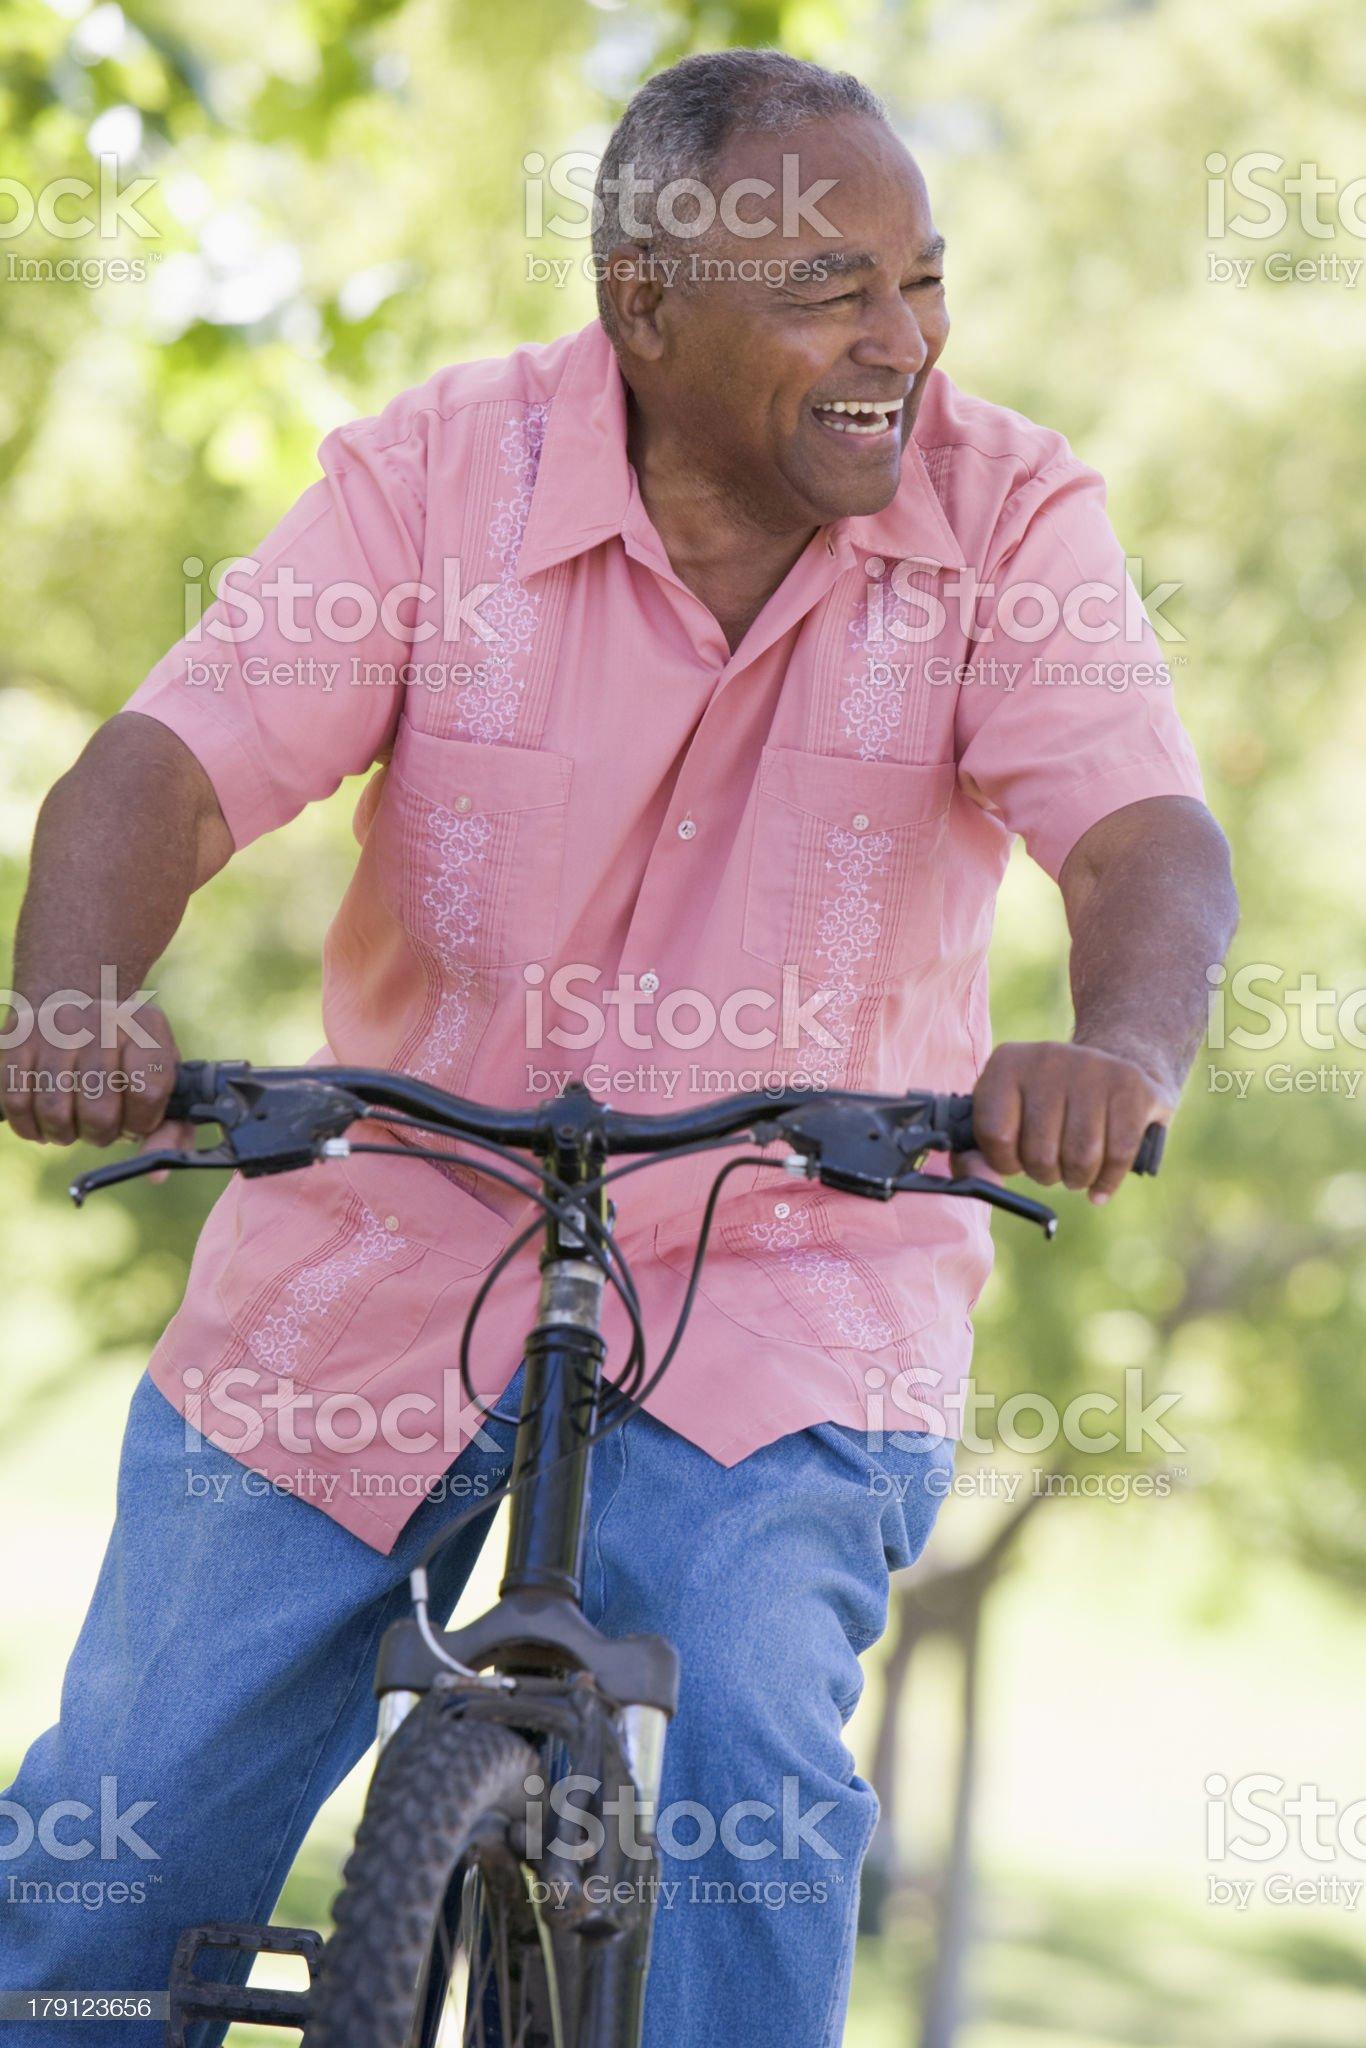 Senior man on cycle ride royalty-free stock photo